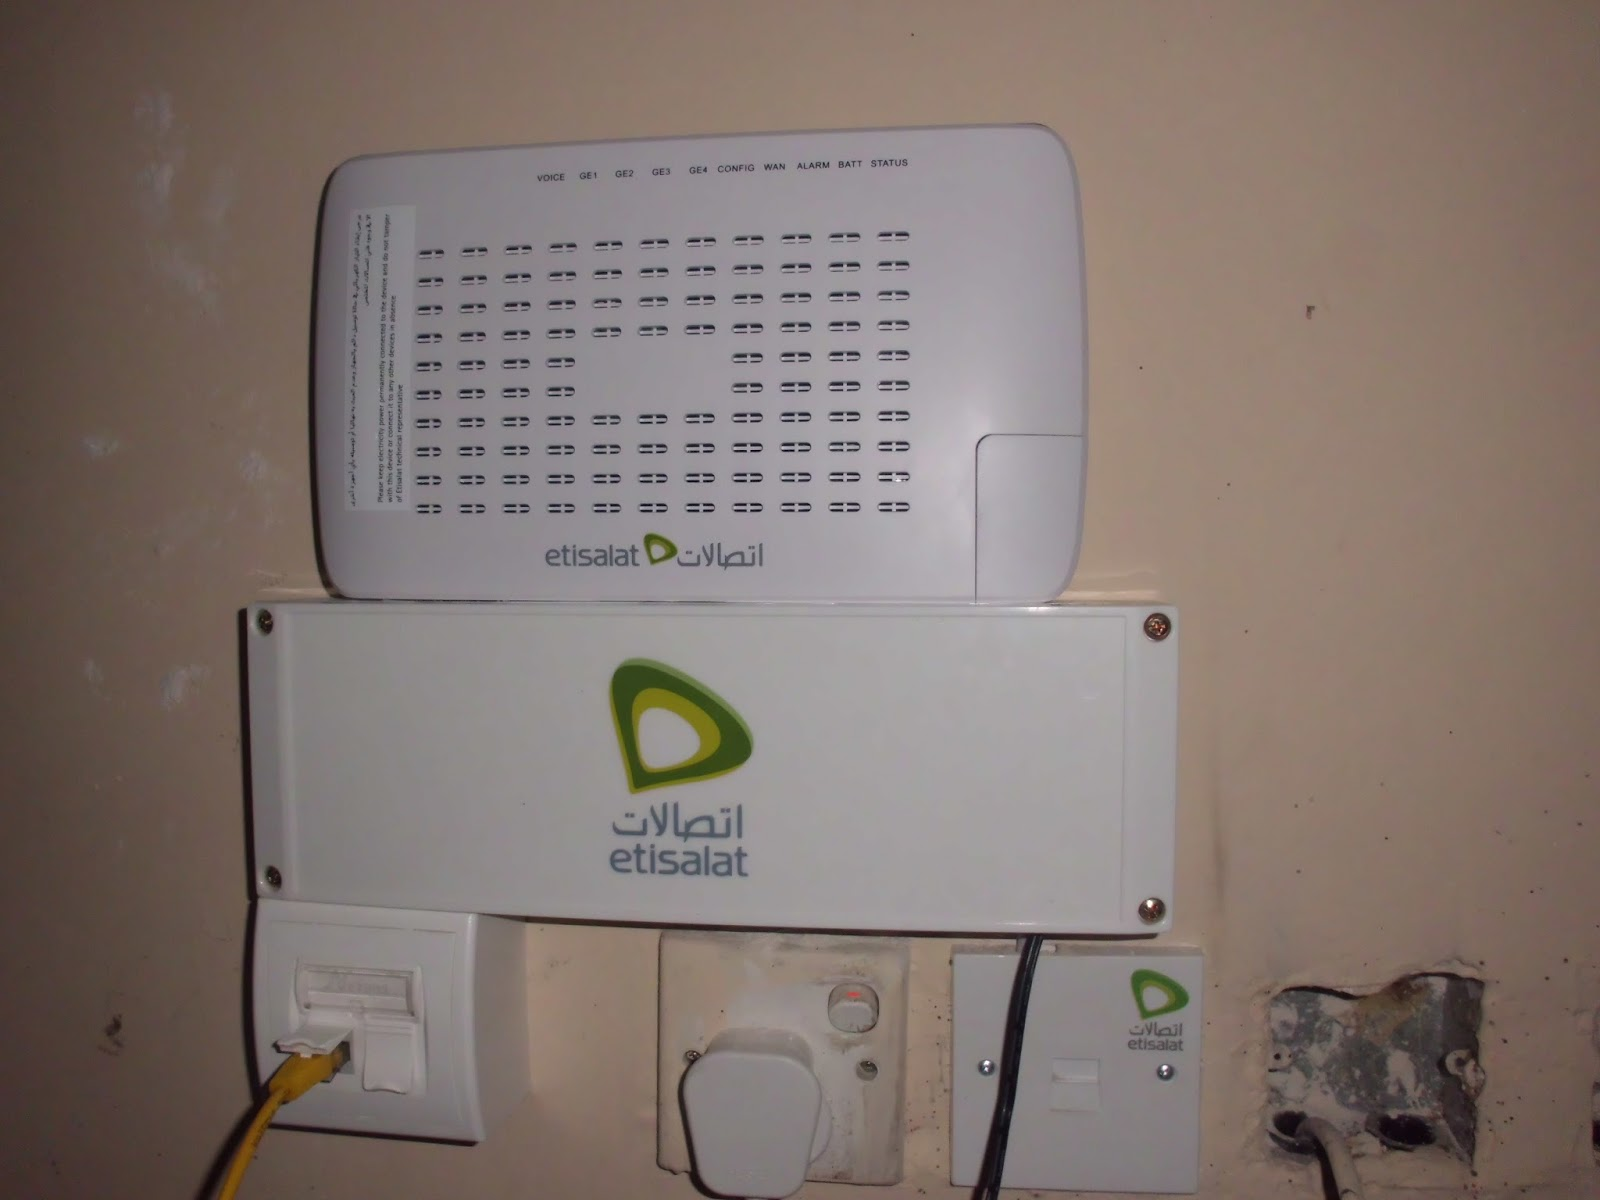 Etisalat Support Installation Standards